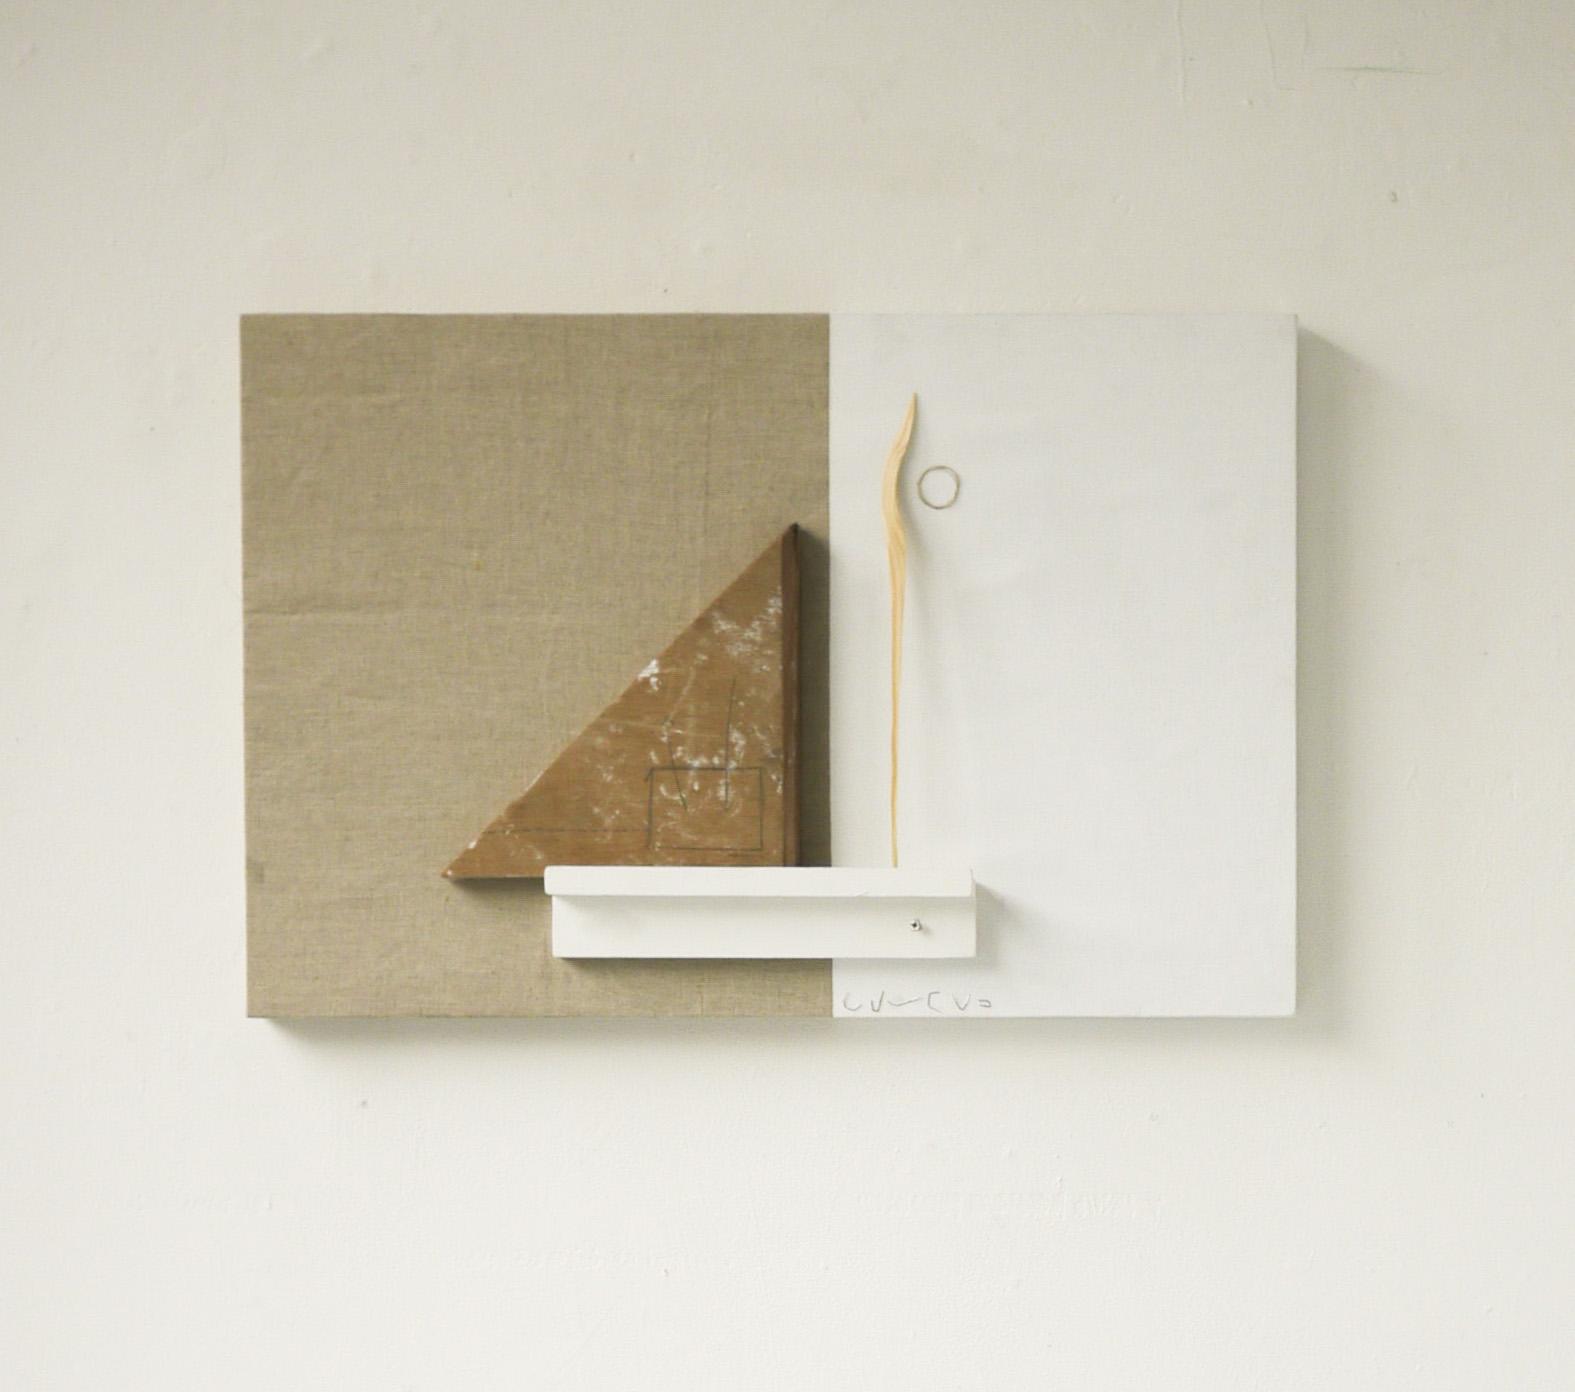 Per Se (2019) Wood, Canvas, Staples and Acrylic on Linen. 75 x 50 x 8cm.jpg